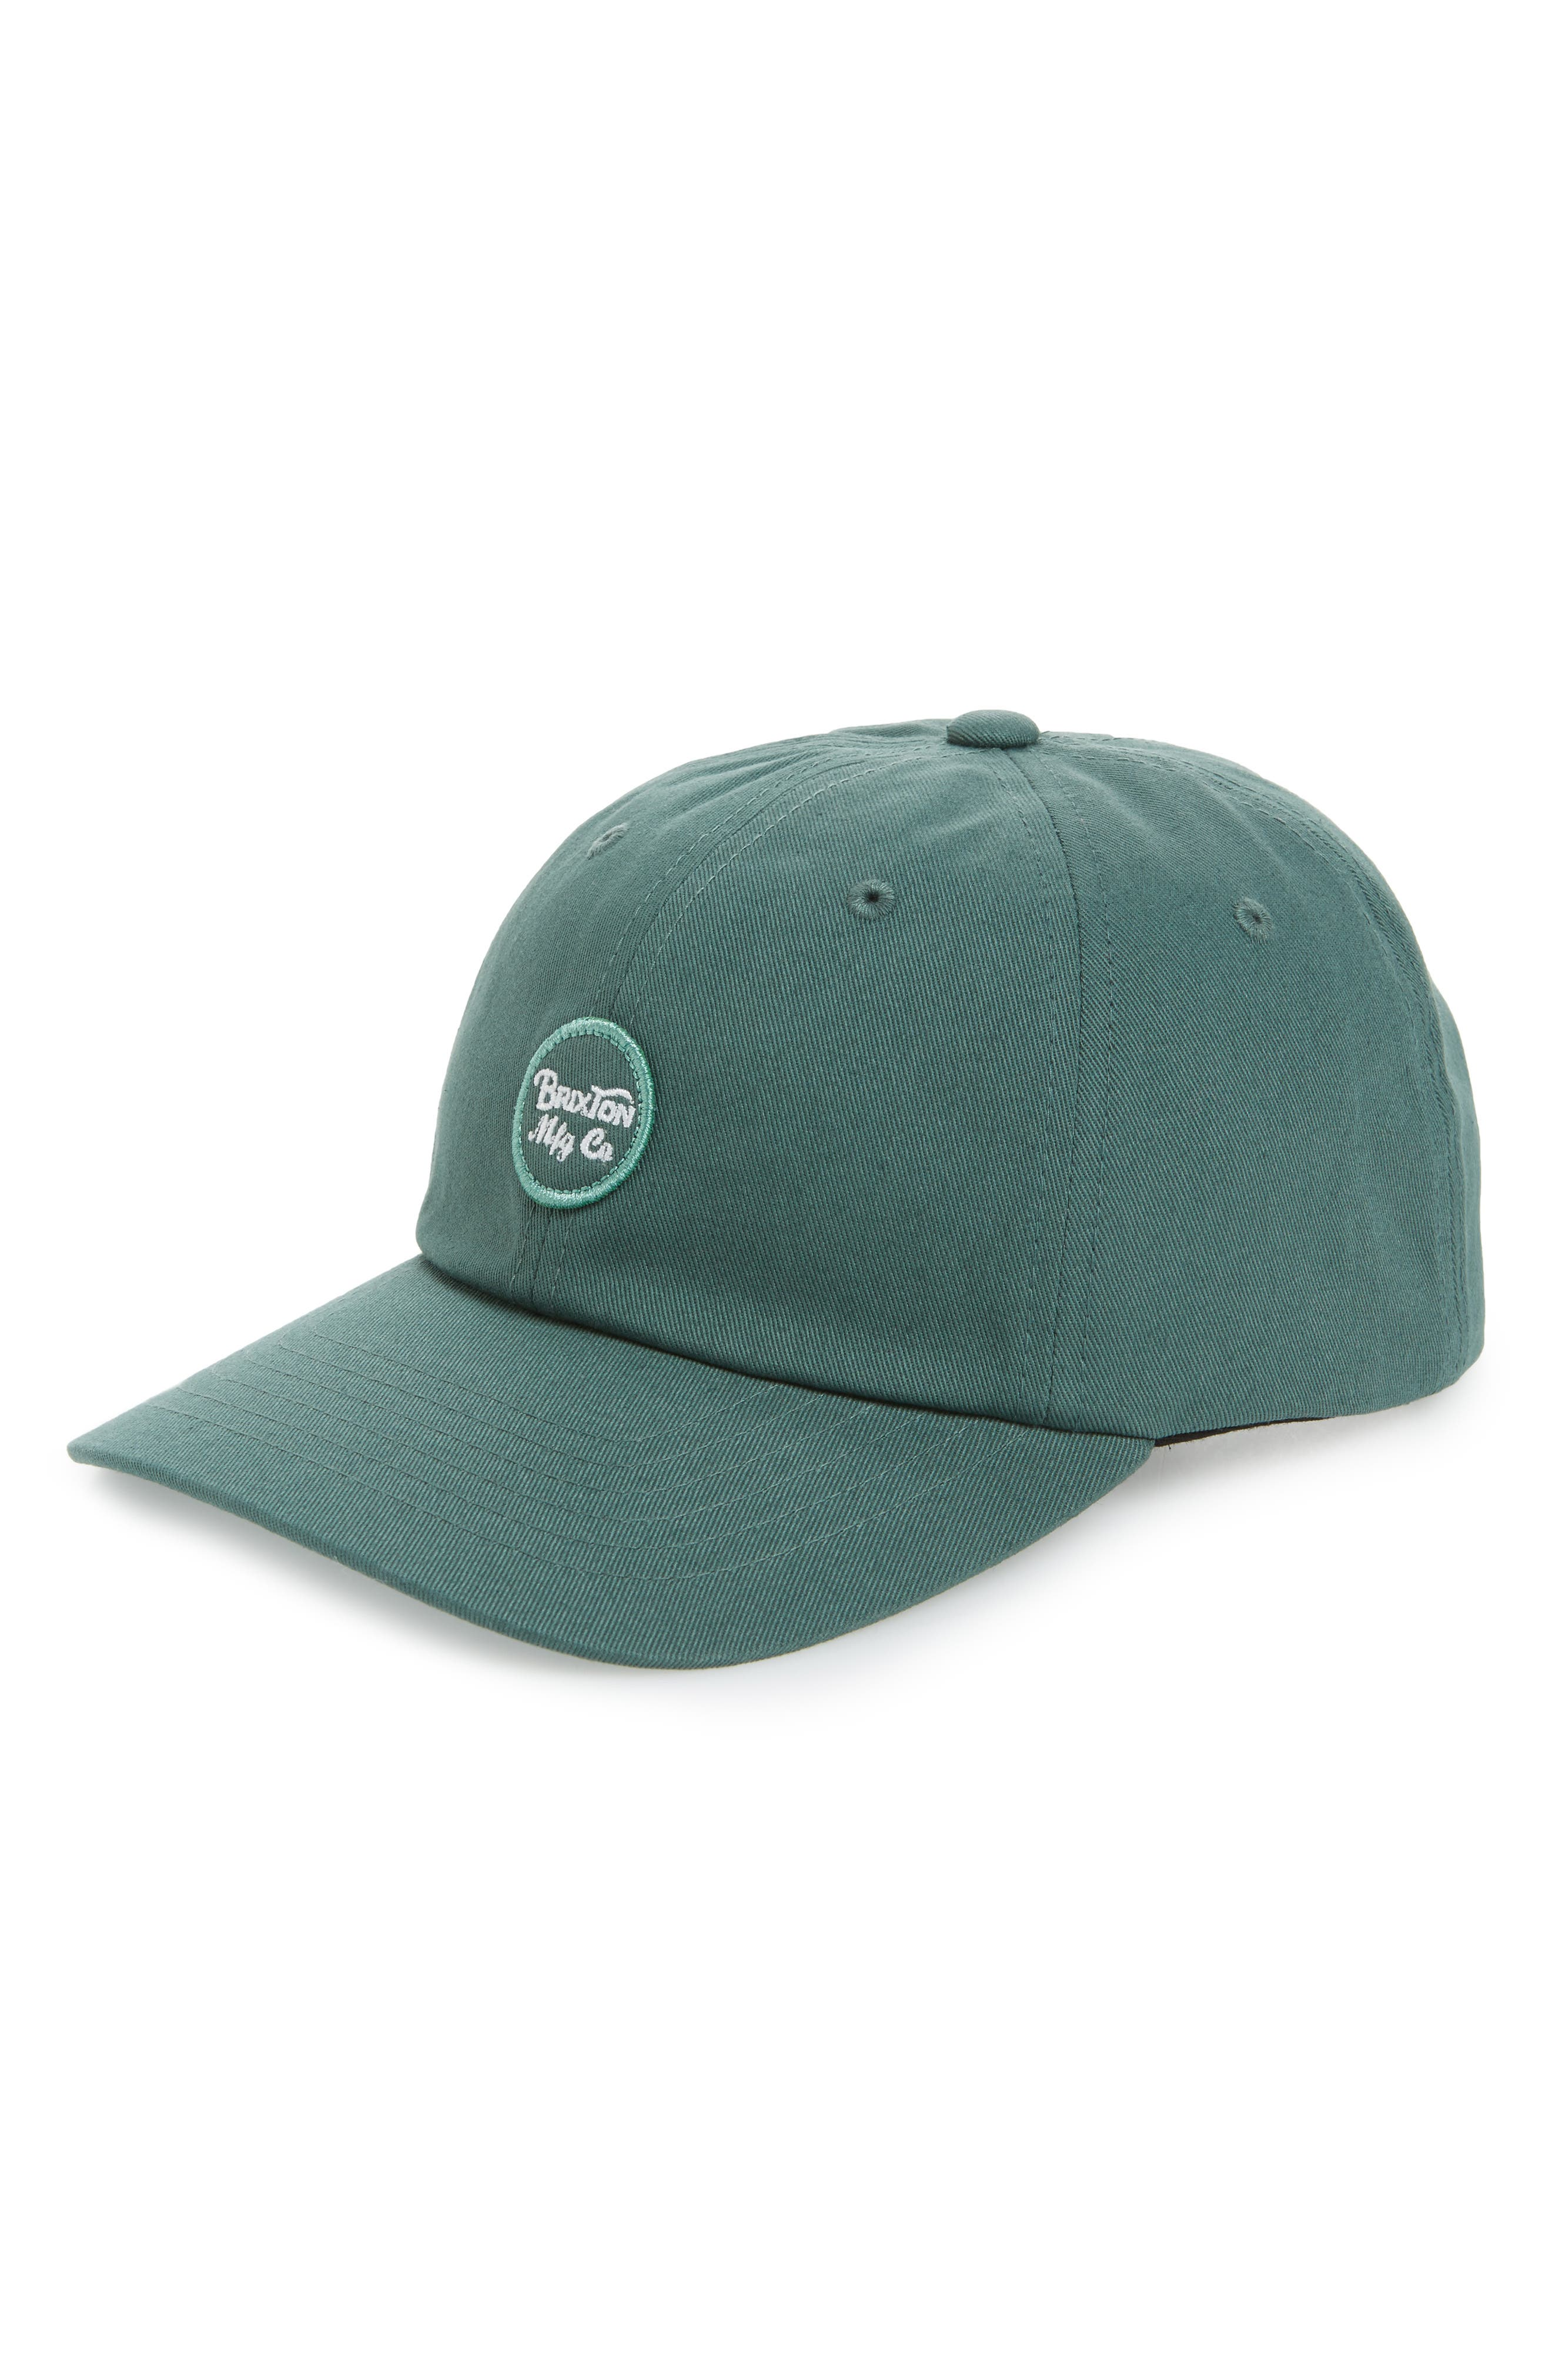 Wheeler Baseball Cap,                         Main,                         color, Chive